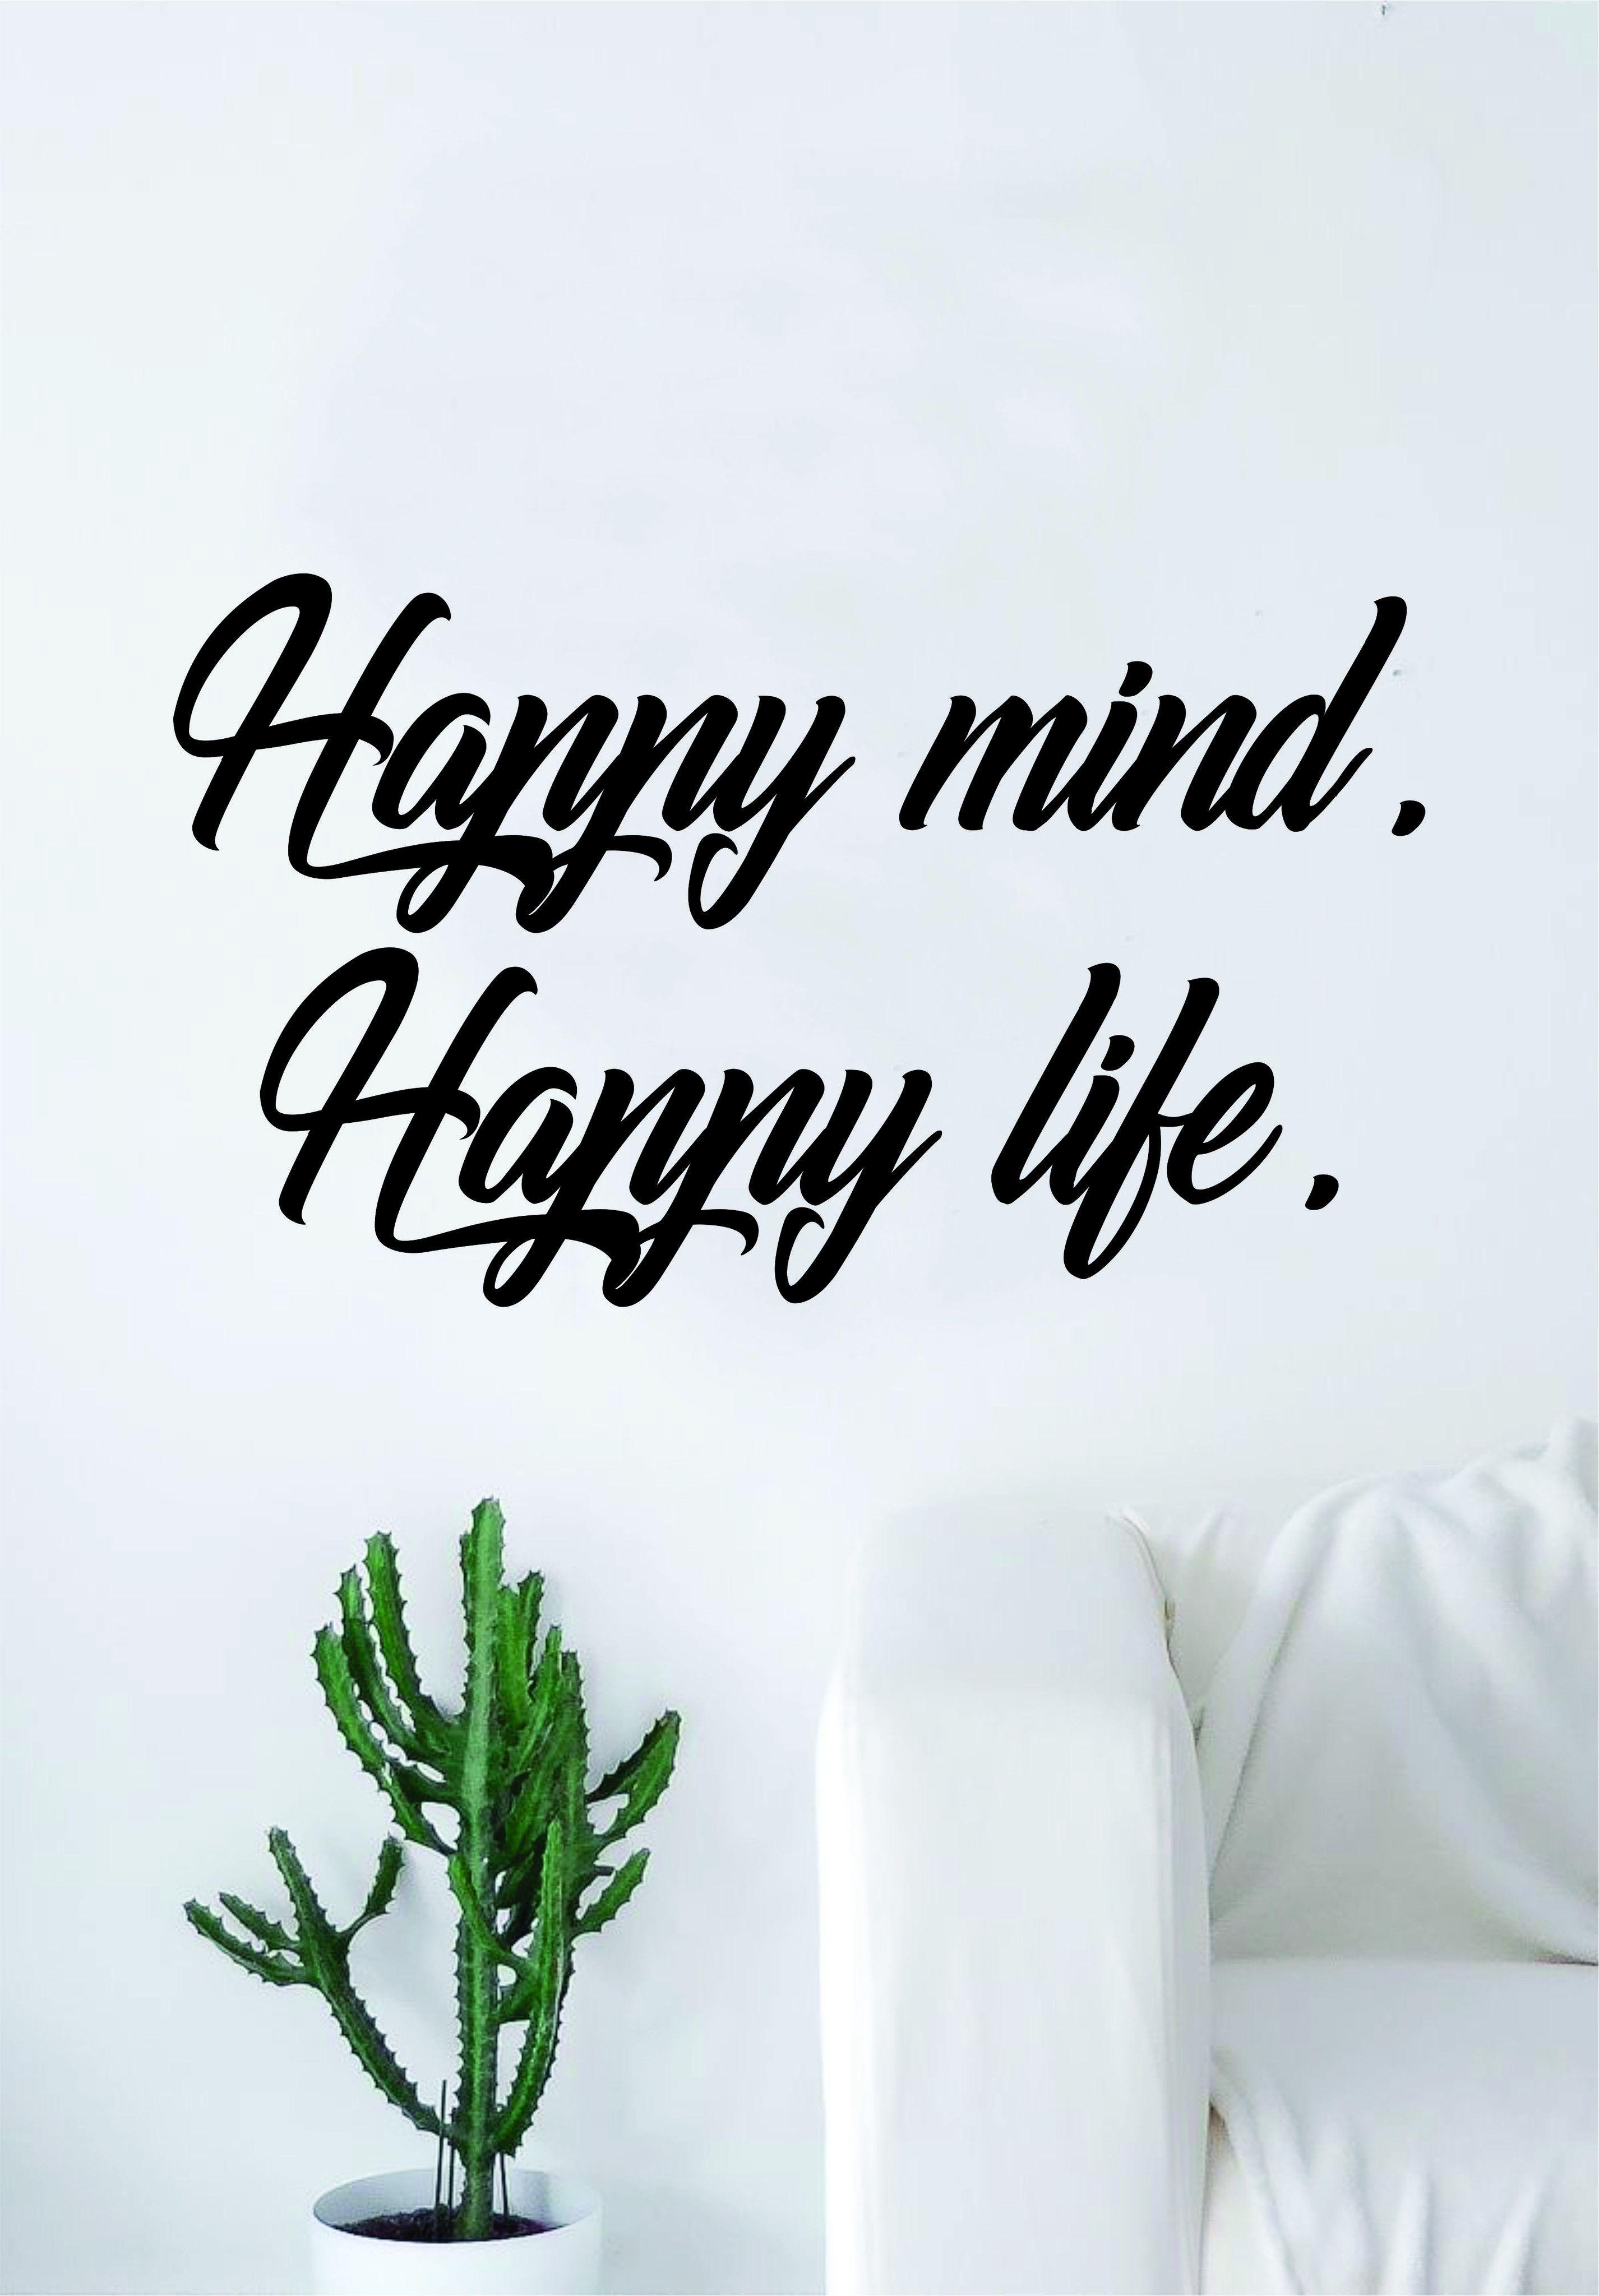 Happy Mind Happy Life Quote Wall Decal Sticker Bedroom Living Room Art Vinyl Beautiful Inspirational Yoga Buddha Zen - orange